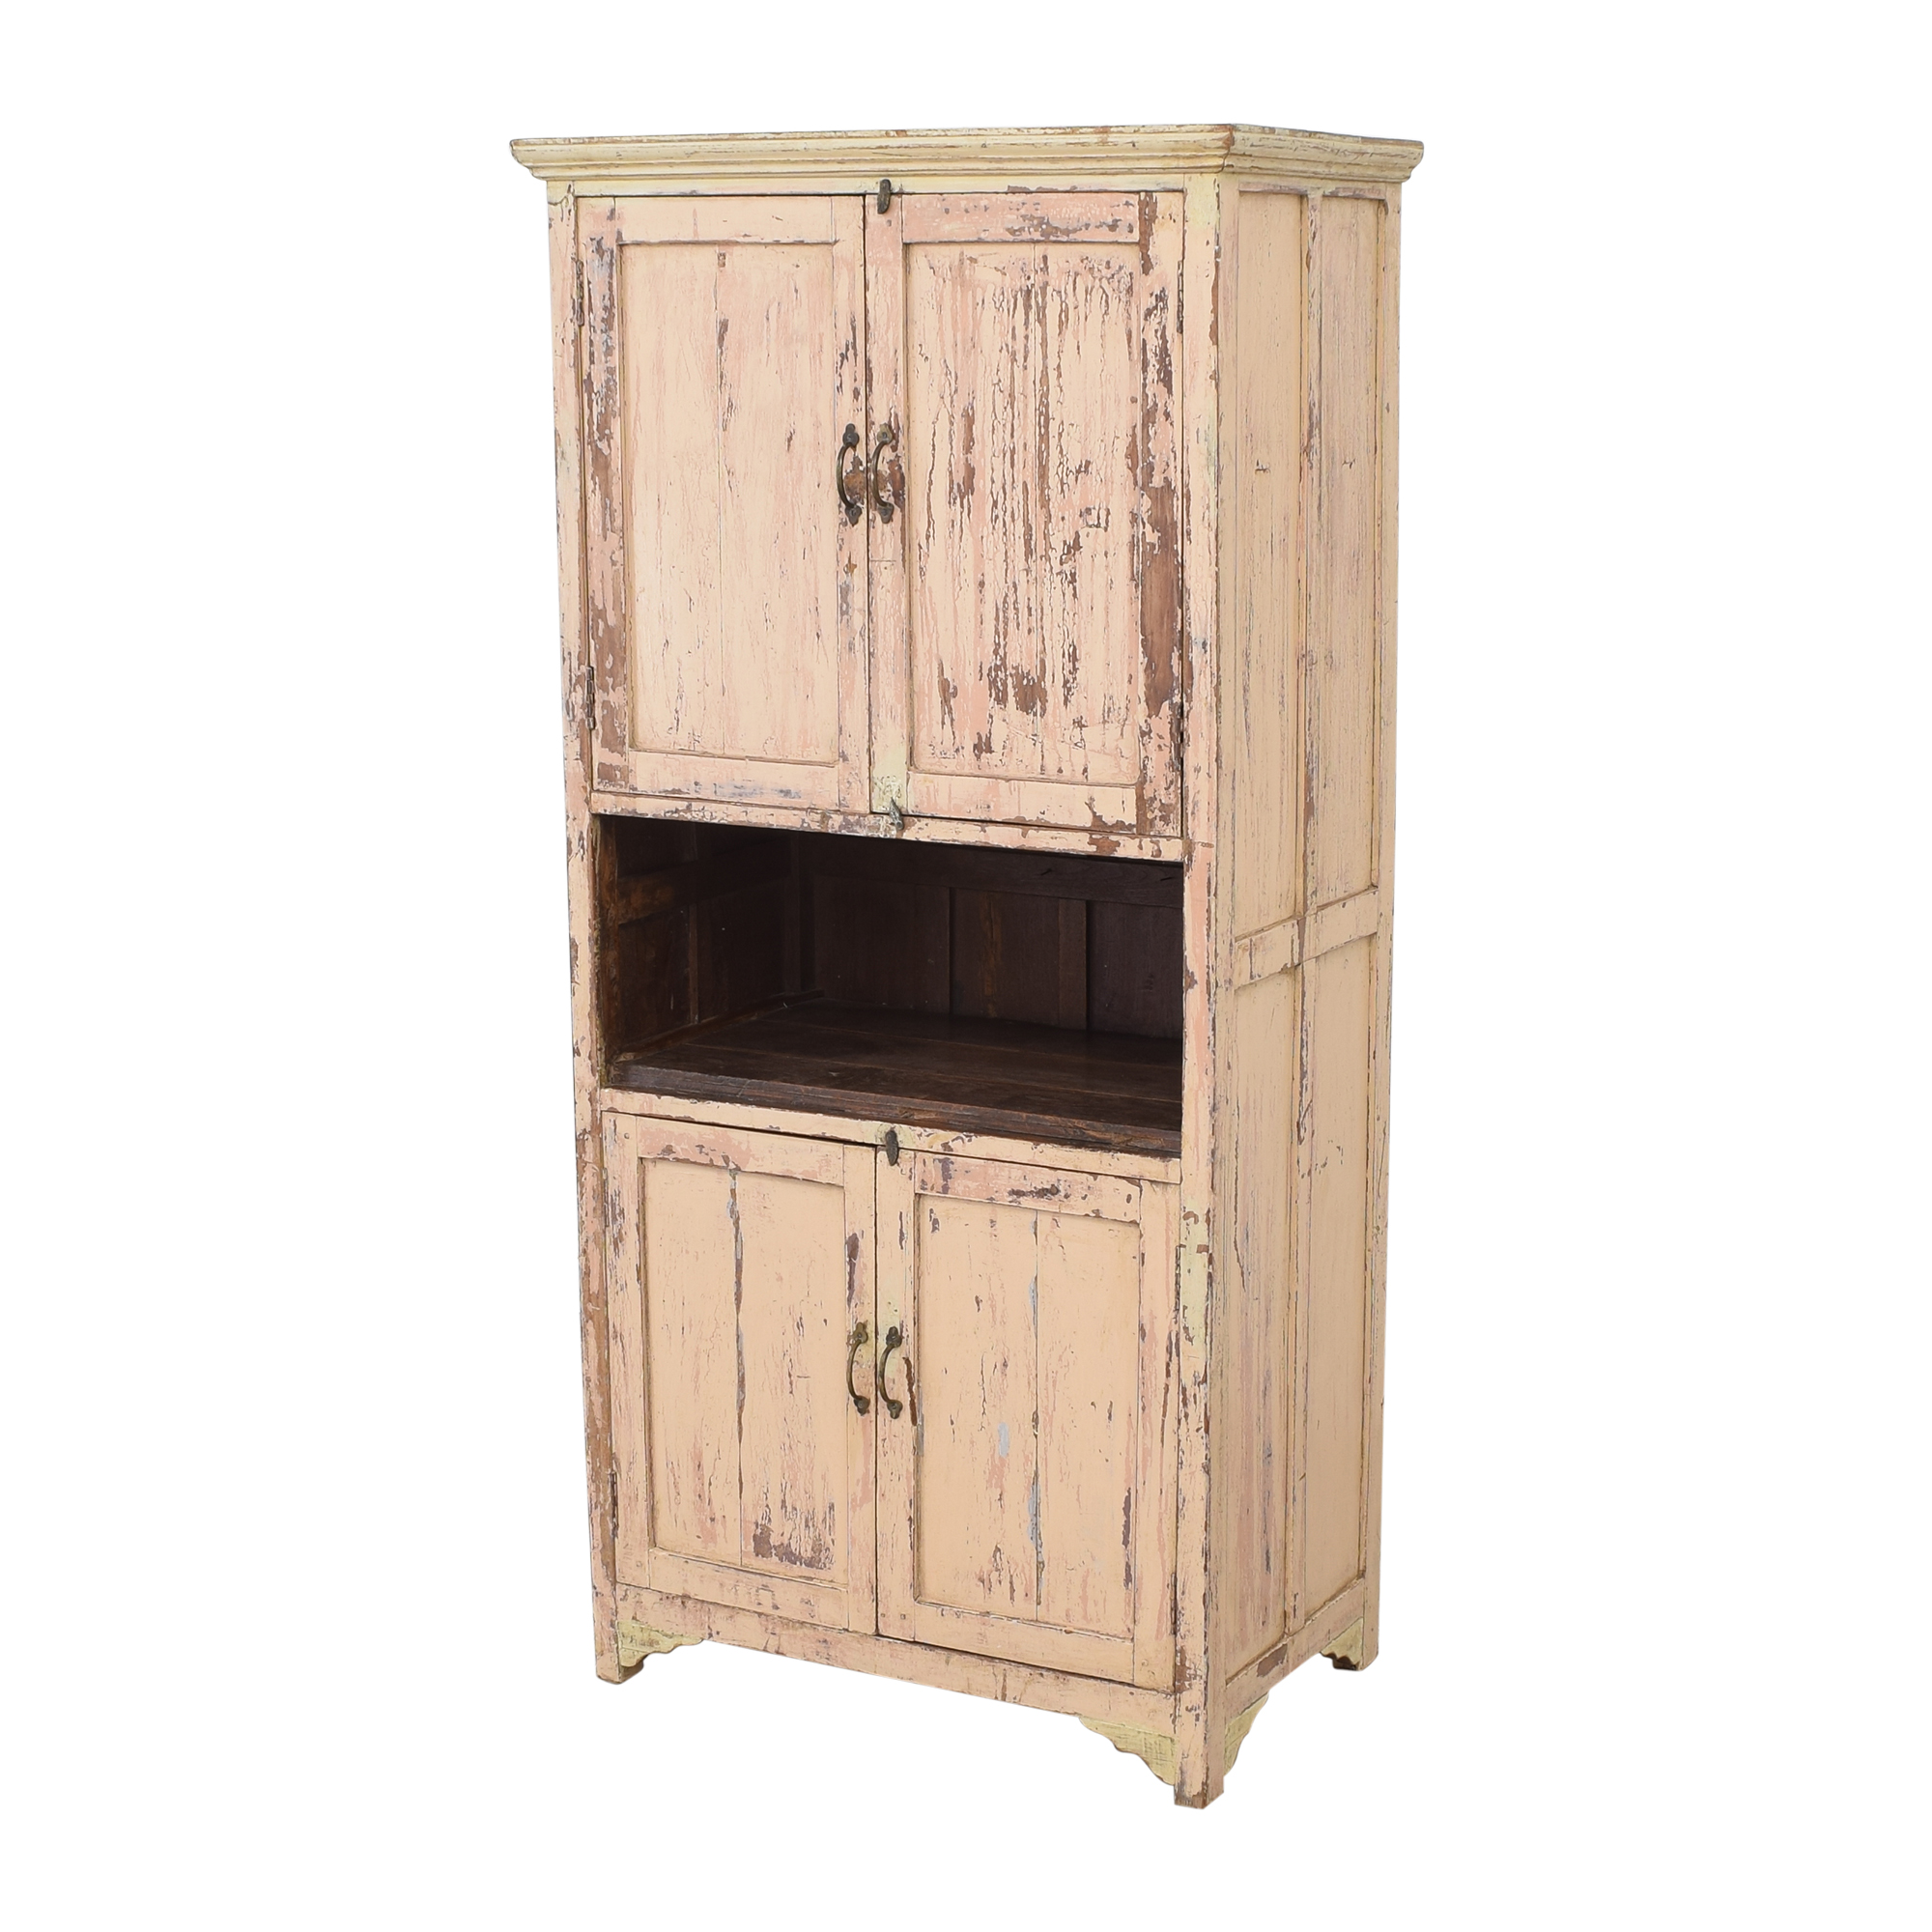 ABC Carpet & Home ABC Carpet & Home Storage Cabinet nj